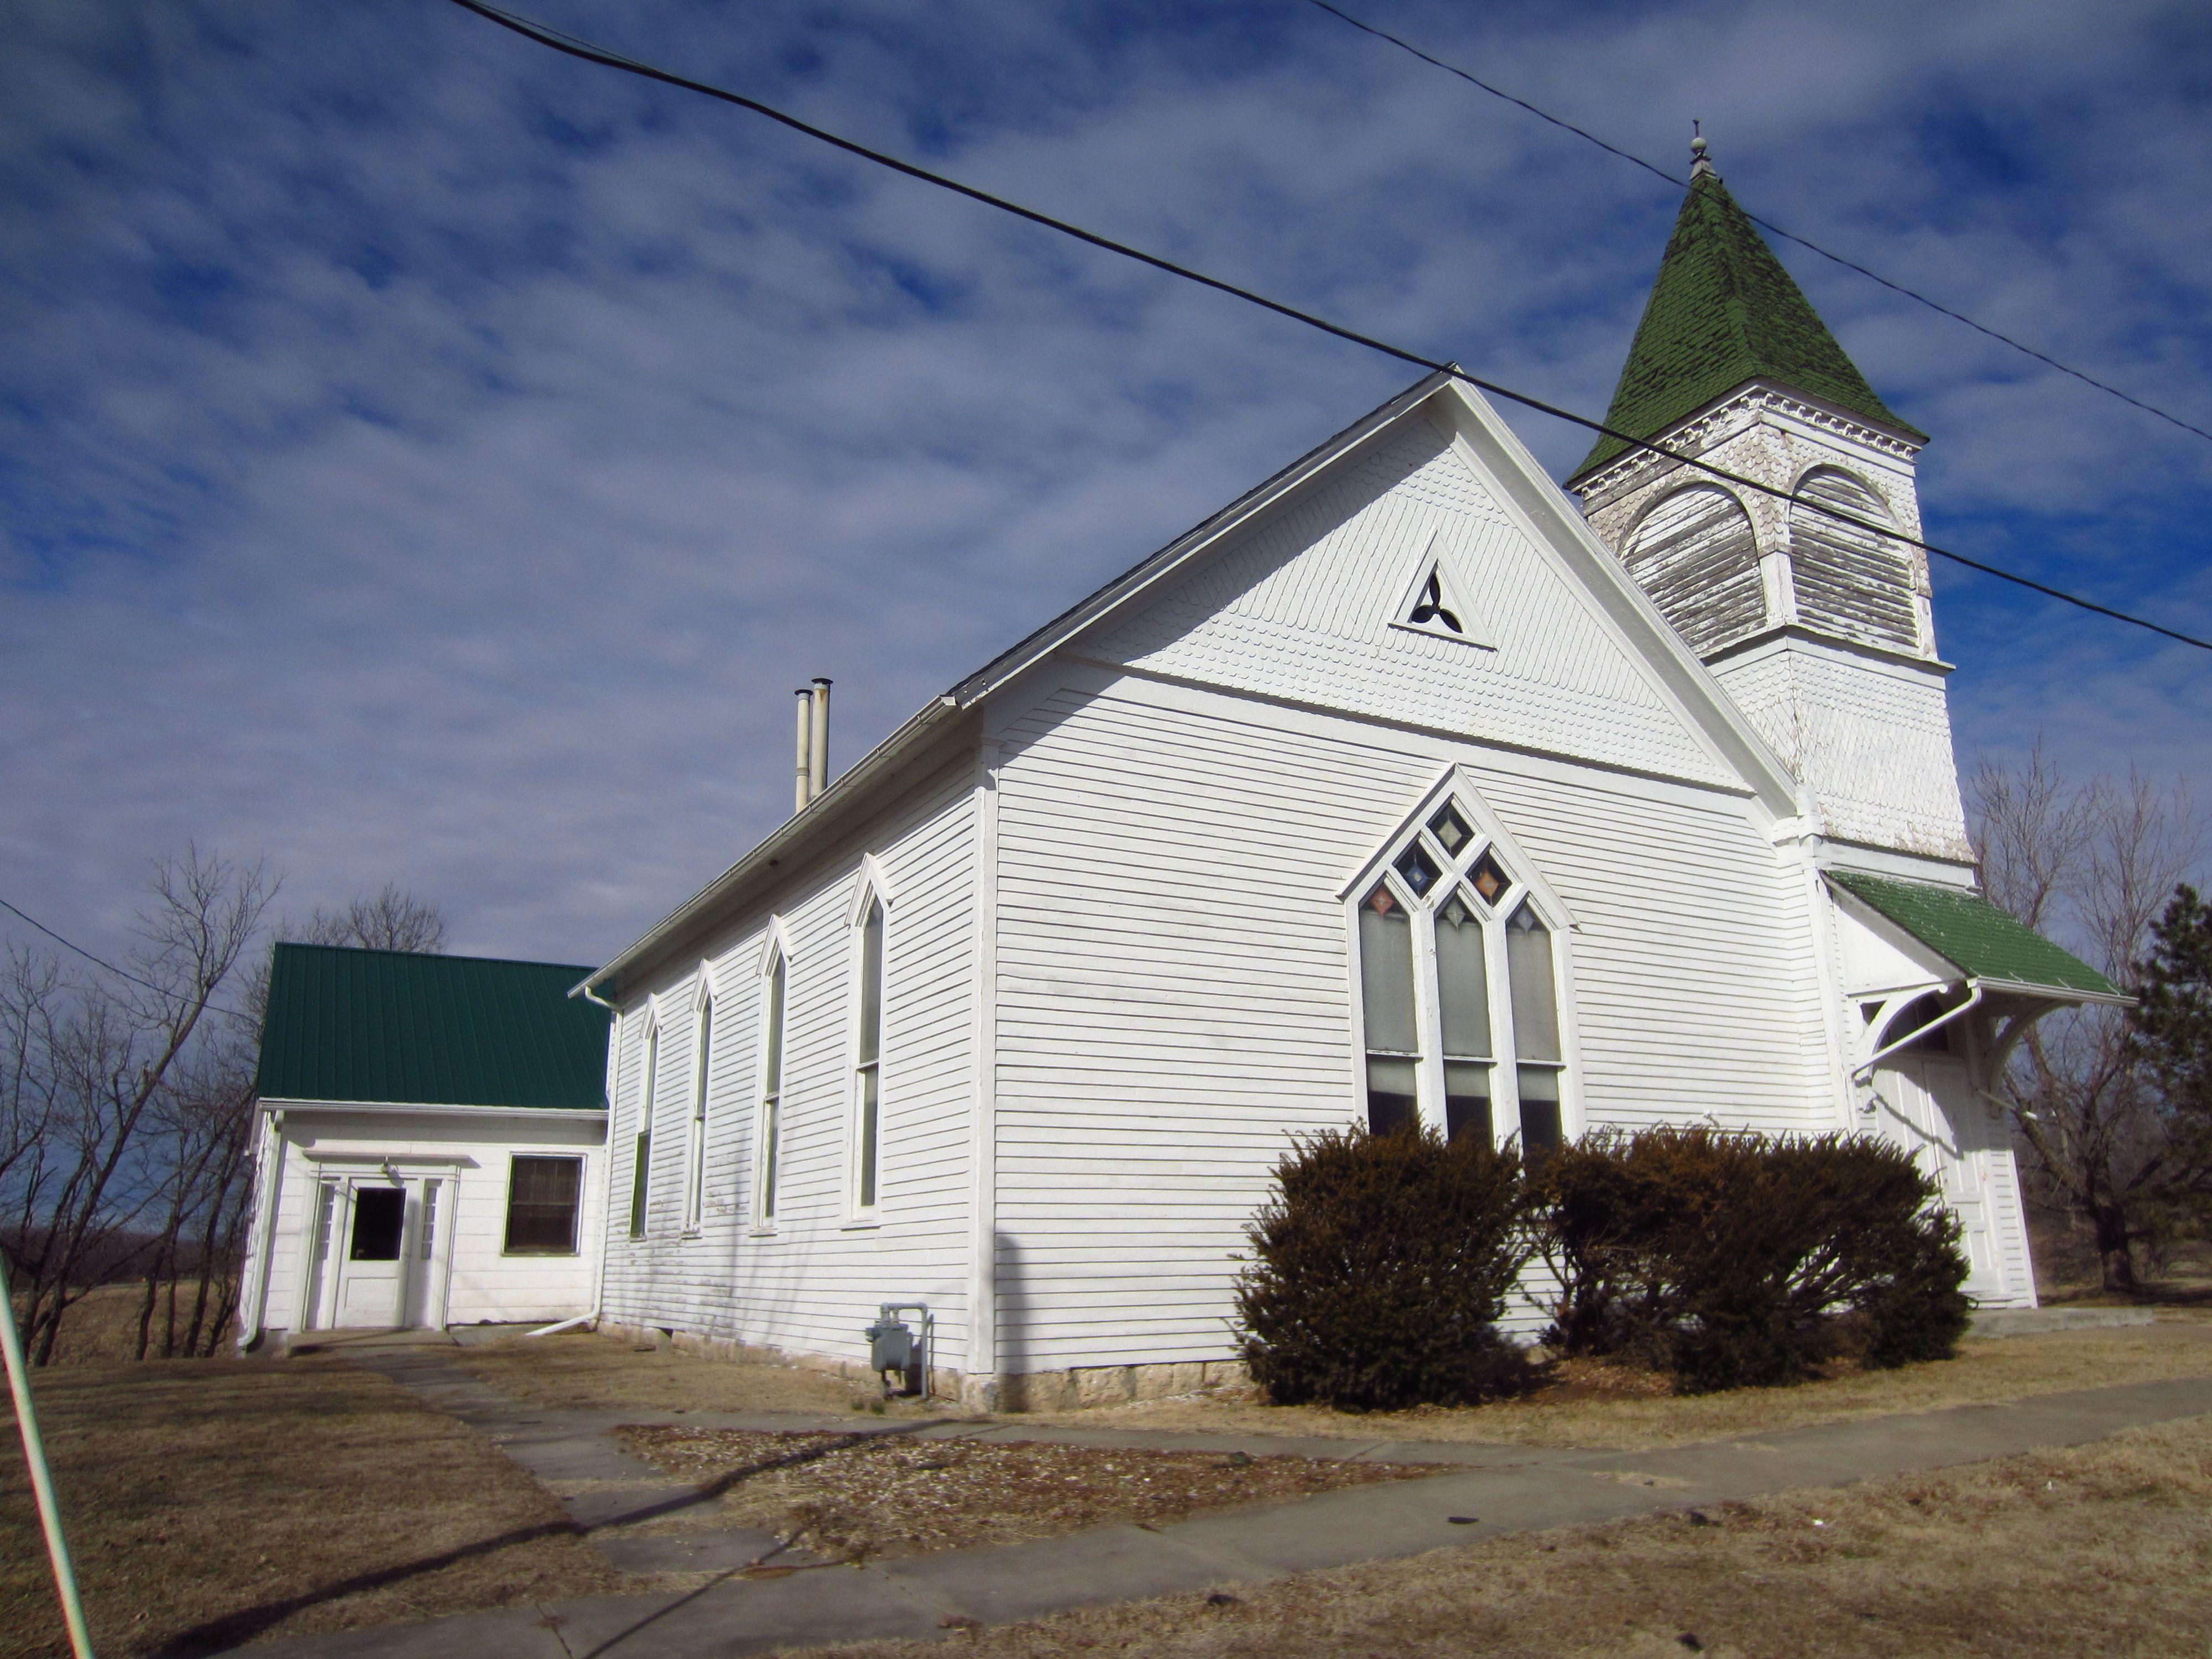 Bethany Brethren Church Hamlin Brown County The Building Reflects A Vernacular Interpretation